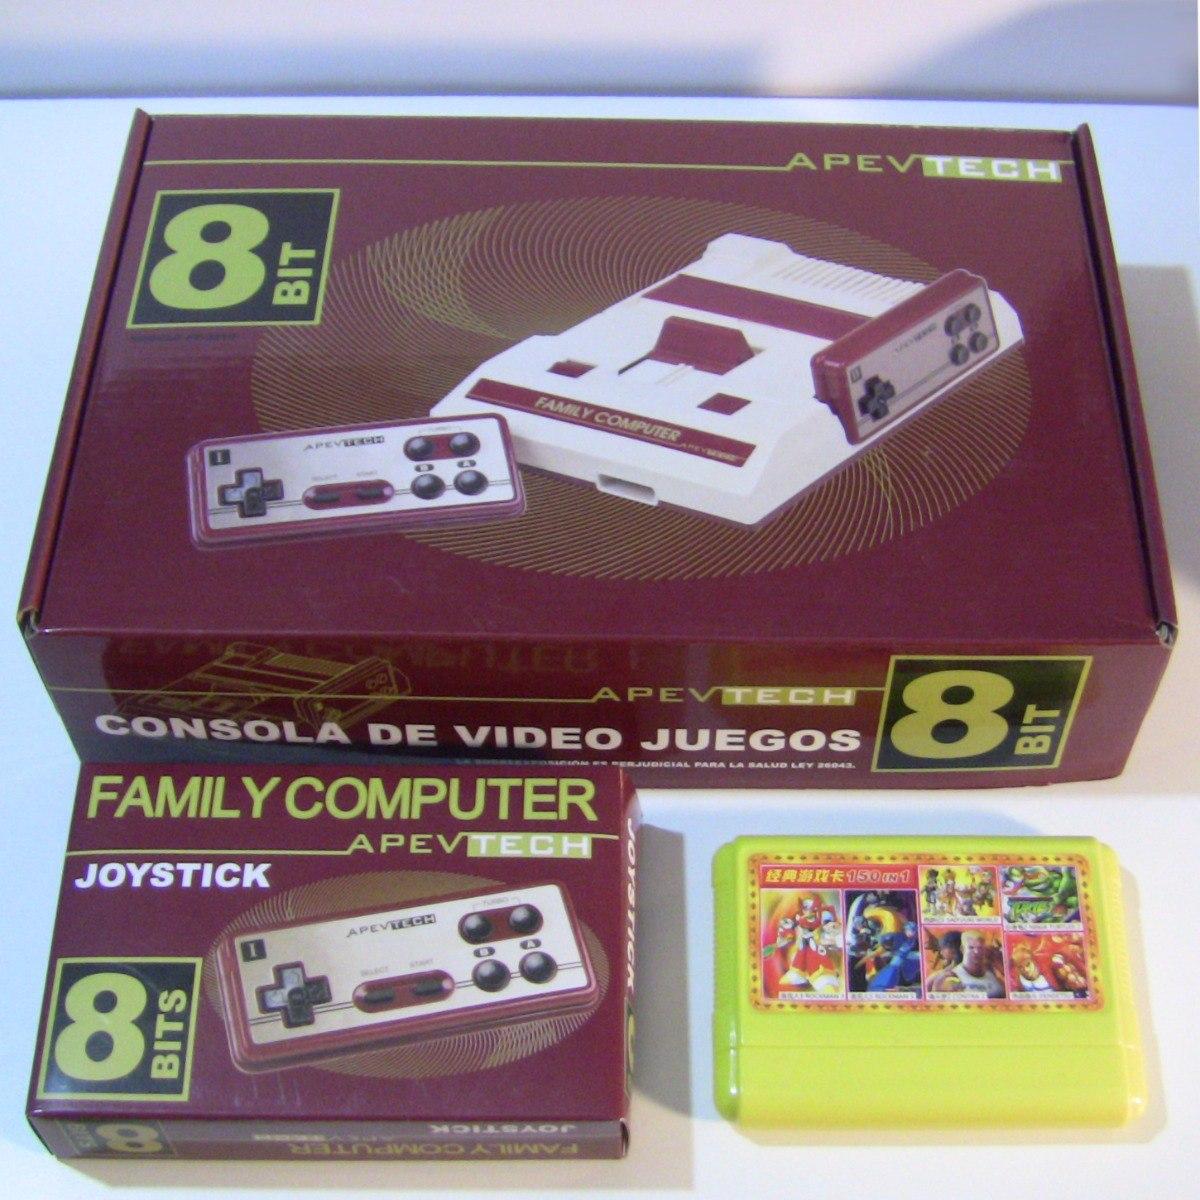 Family Game Apvtech Retro 2 Joystick Mejores 150 Juegos